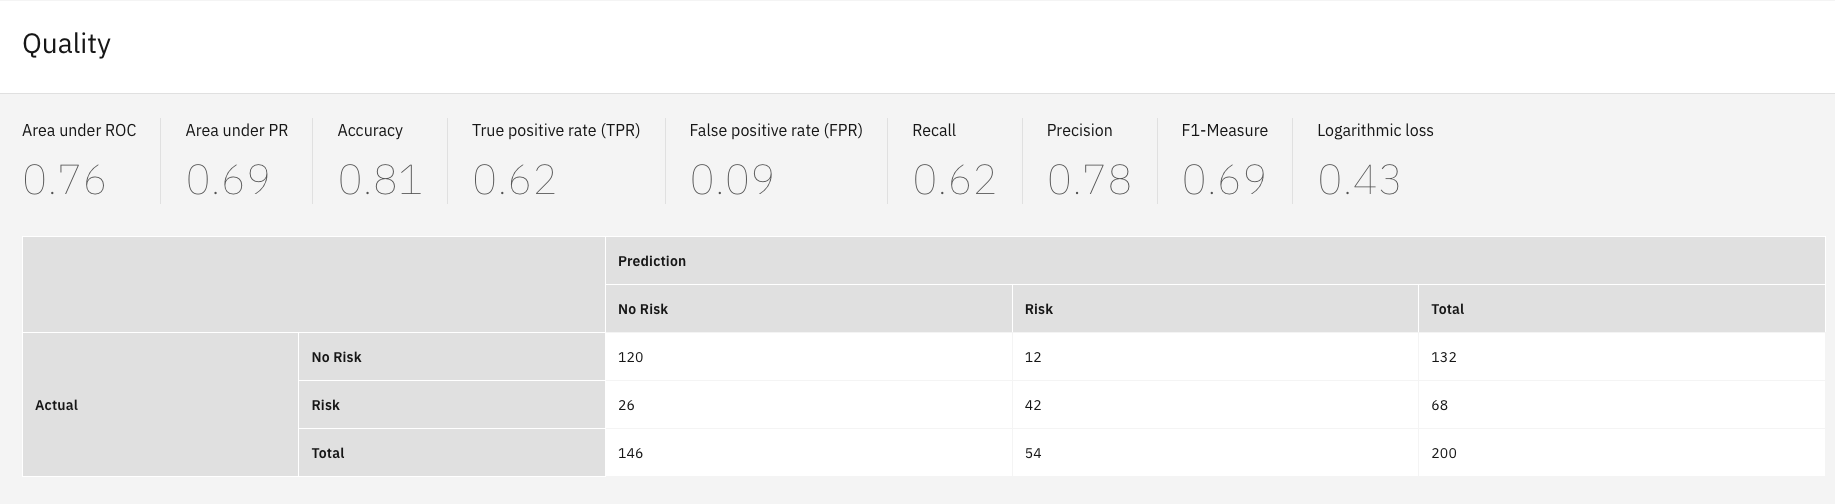 detail table of quality metrics